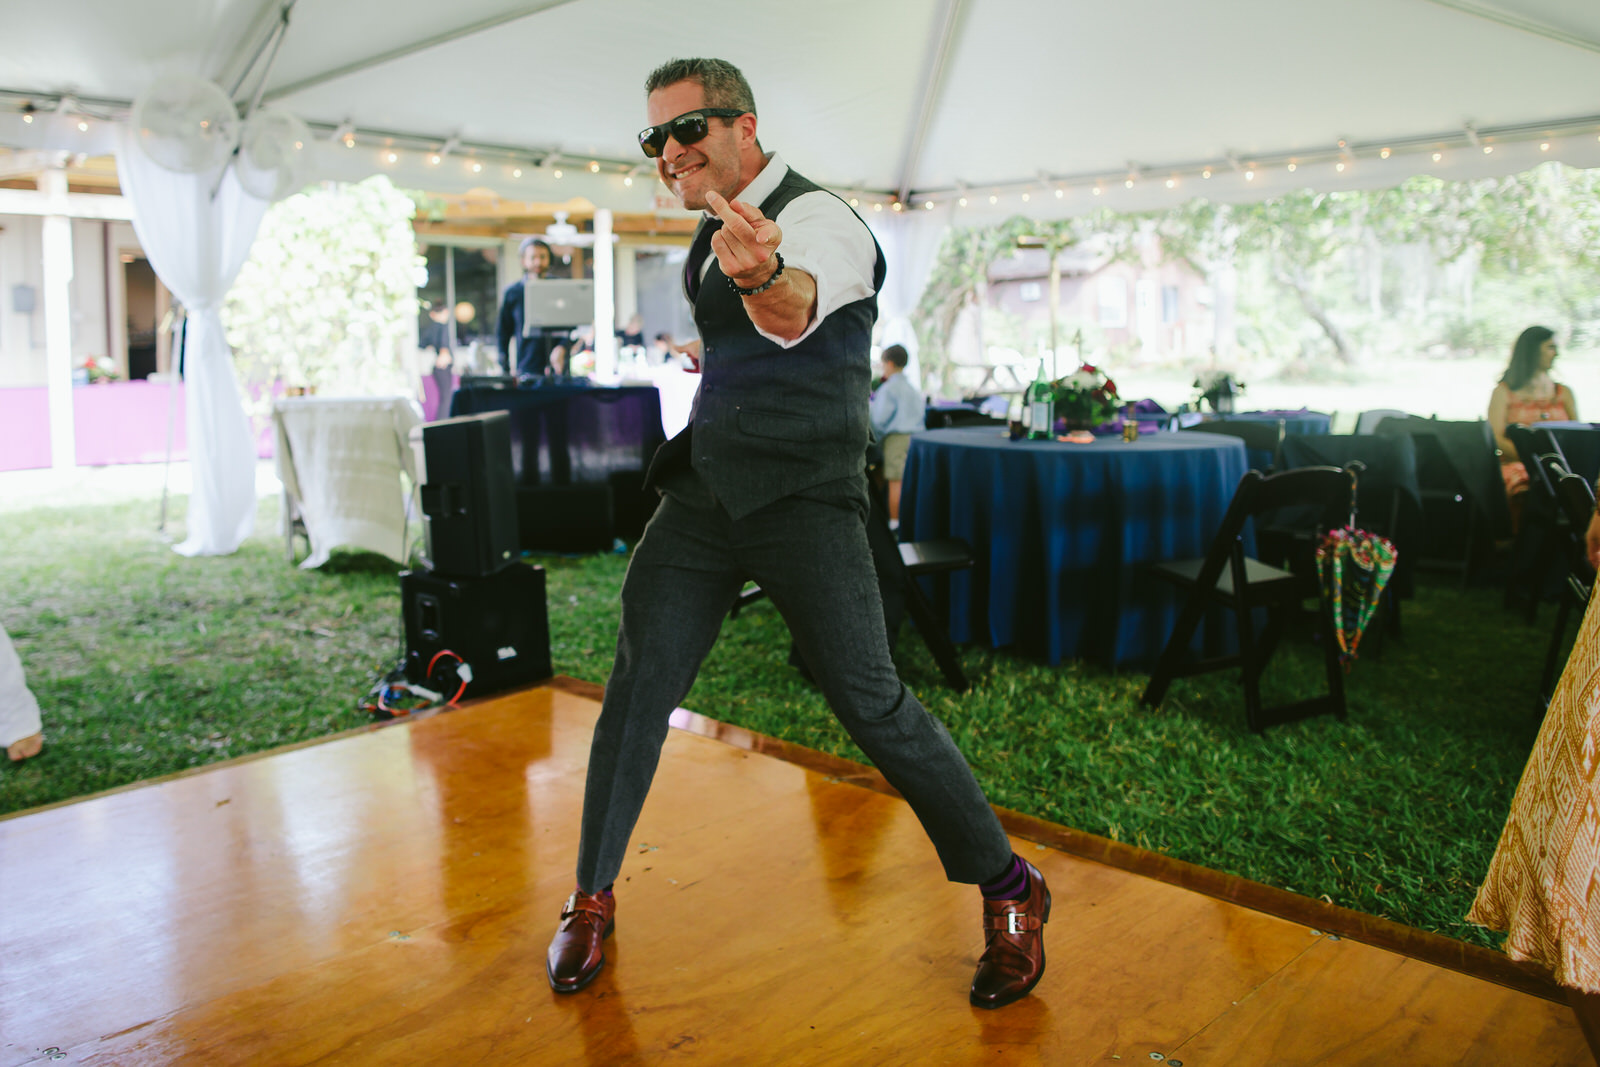 kashi-wedding-reception-tiny-house-photo-dancing.jpg